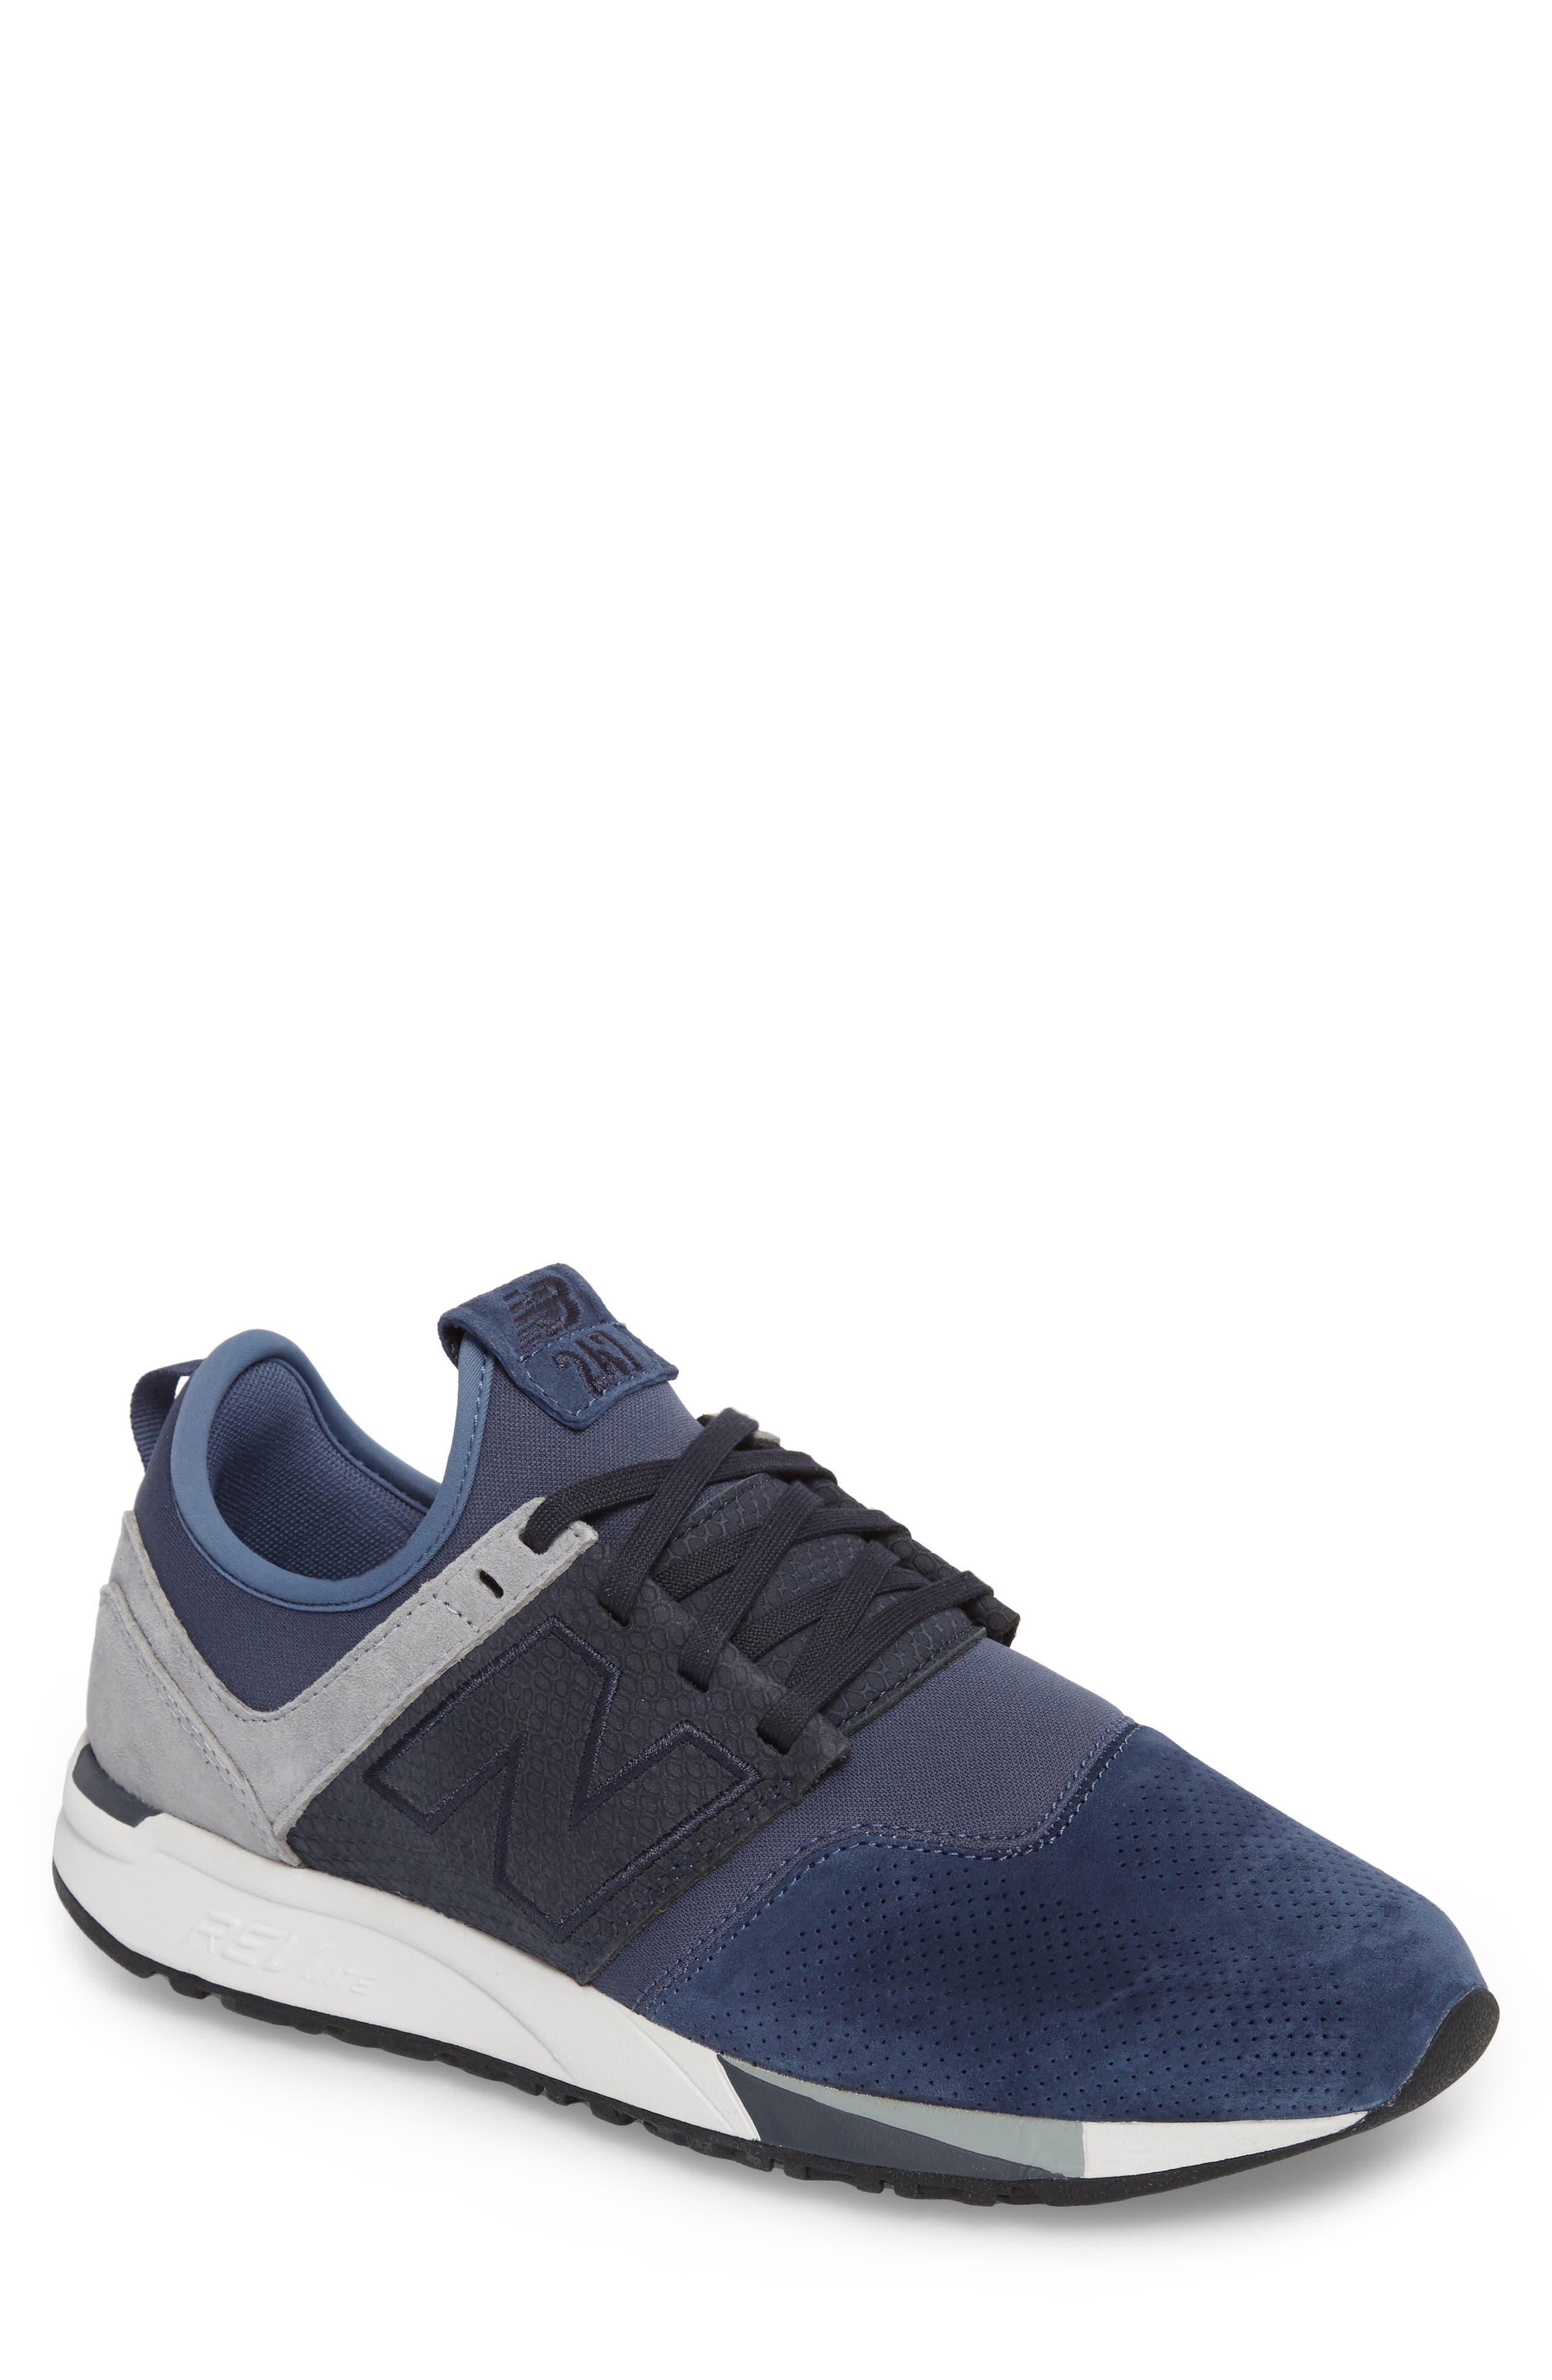 Main Image - New Balance 247 Luxe Sneaker (Men)